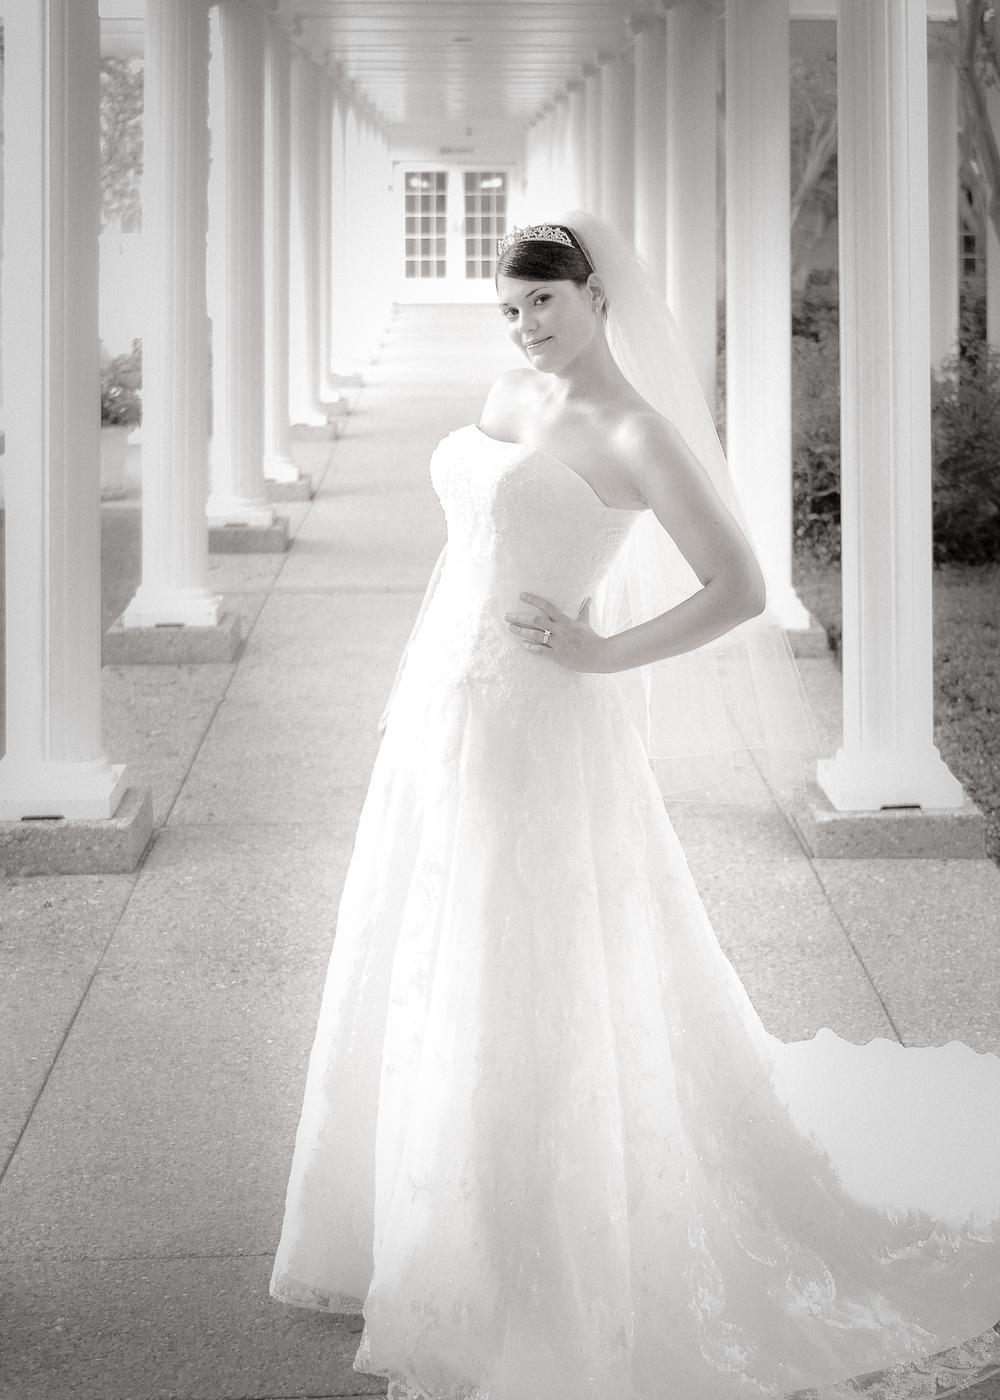 Michael-Napier-Weddings-Gray-Bridal-47 (4).jpg